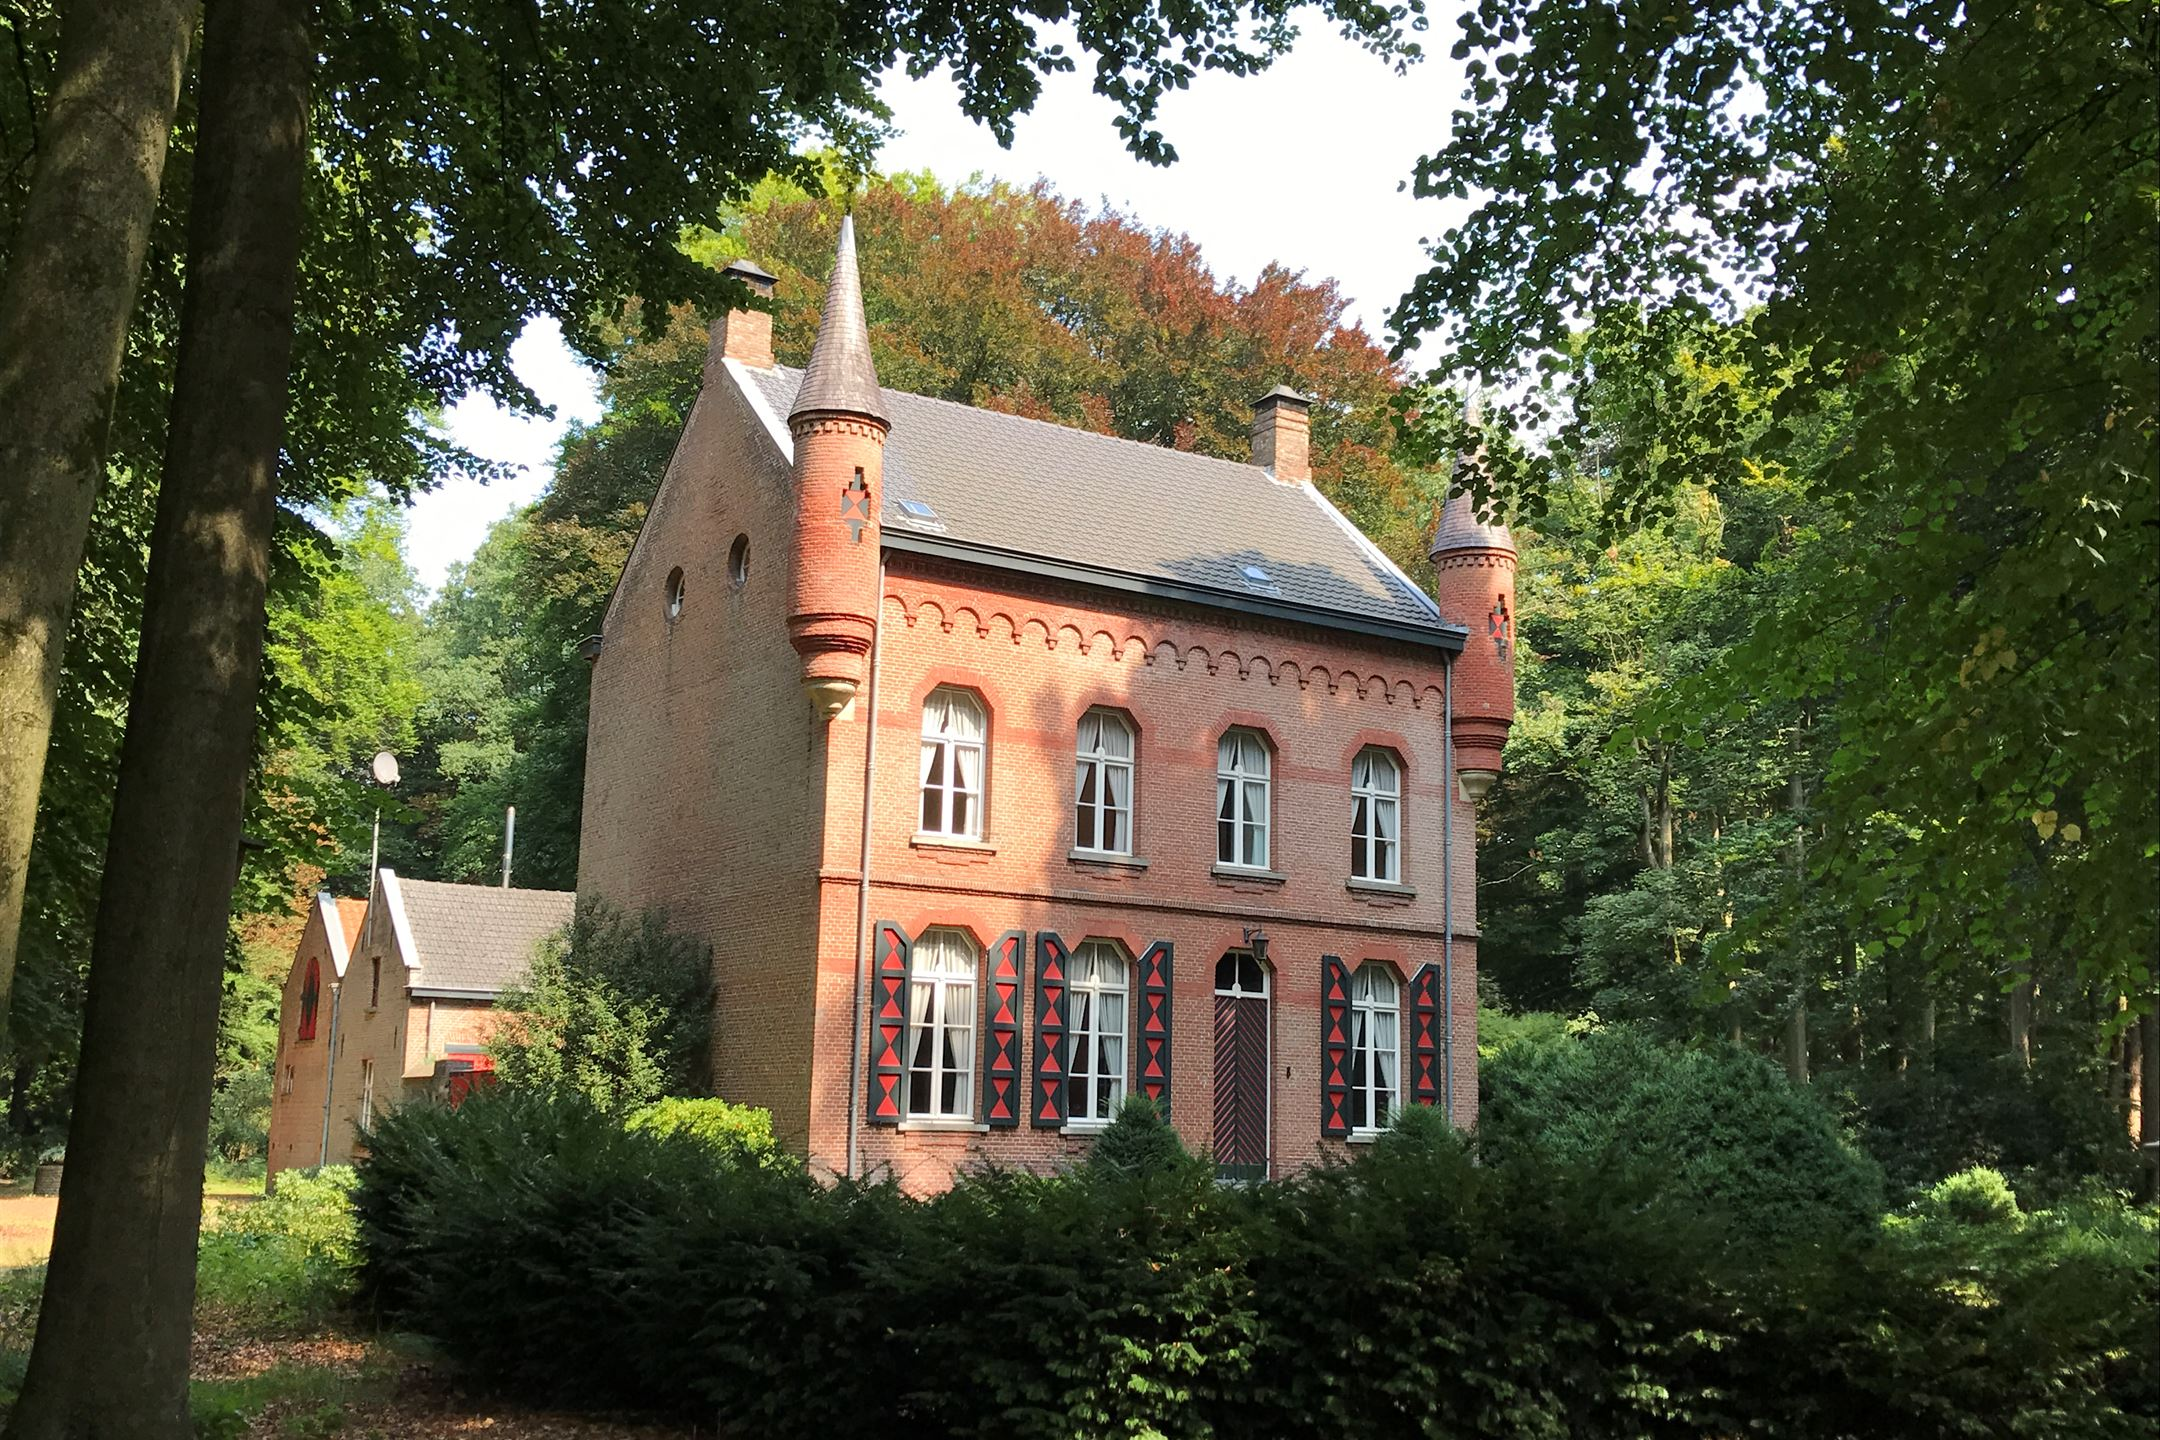 Verkocht gorp 8 5081 nb hilvarenbeek funda for Funda landgoed